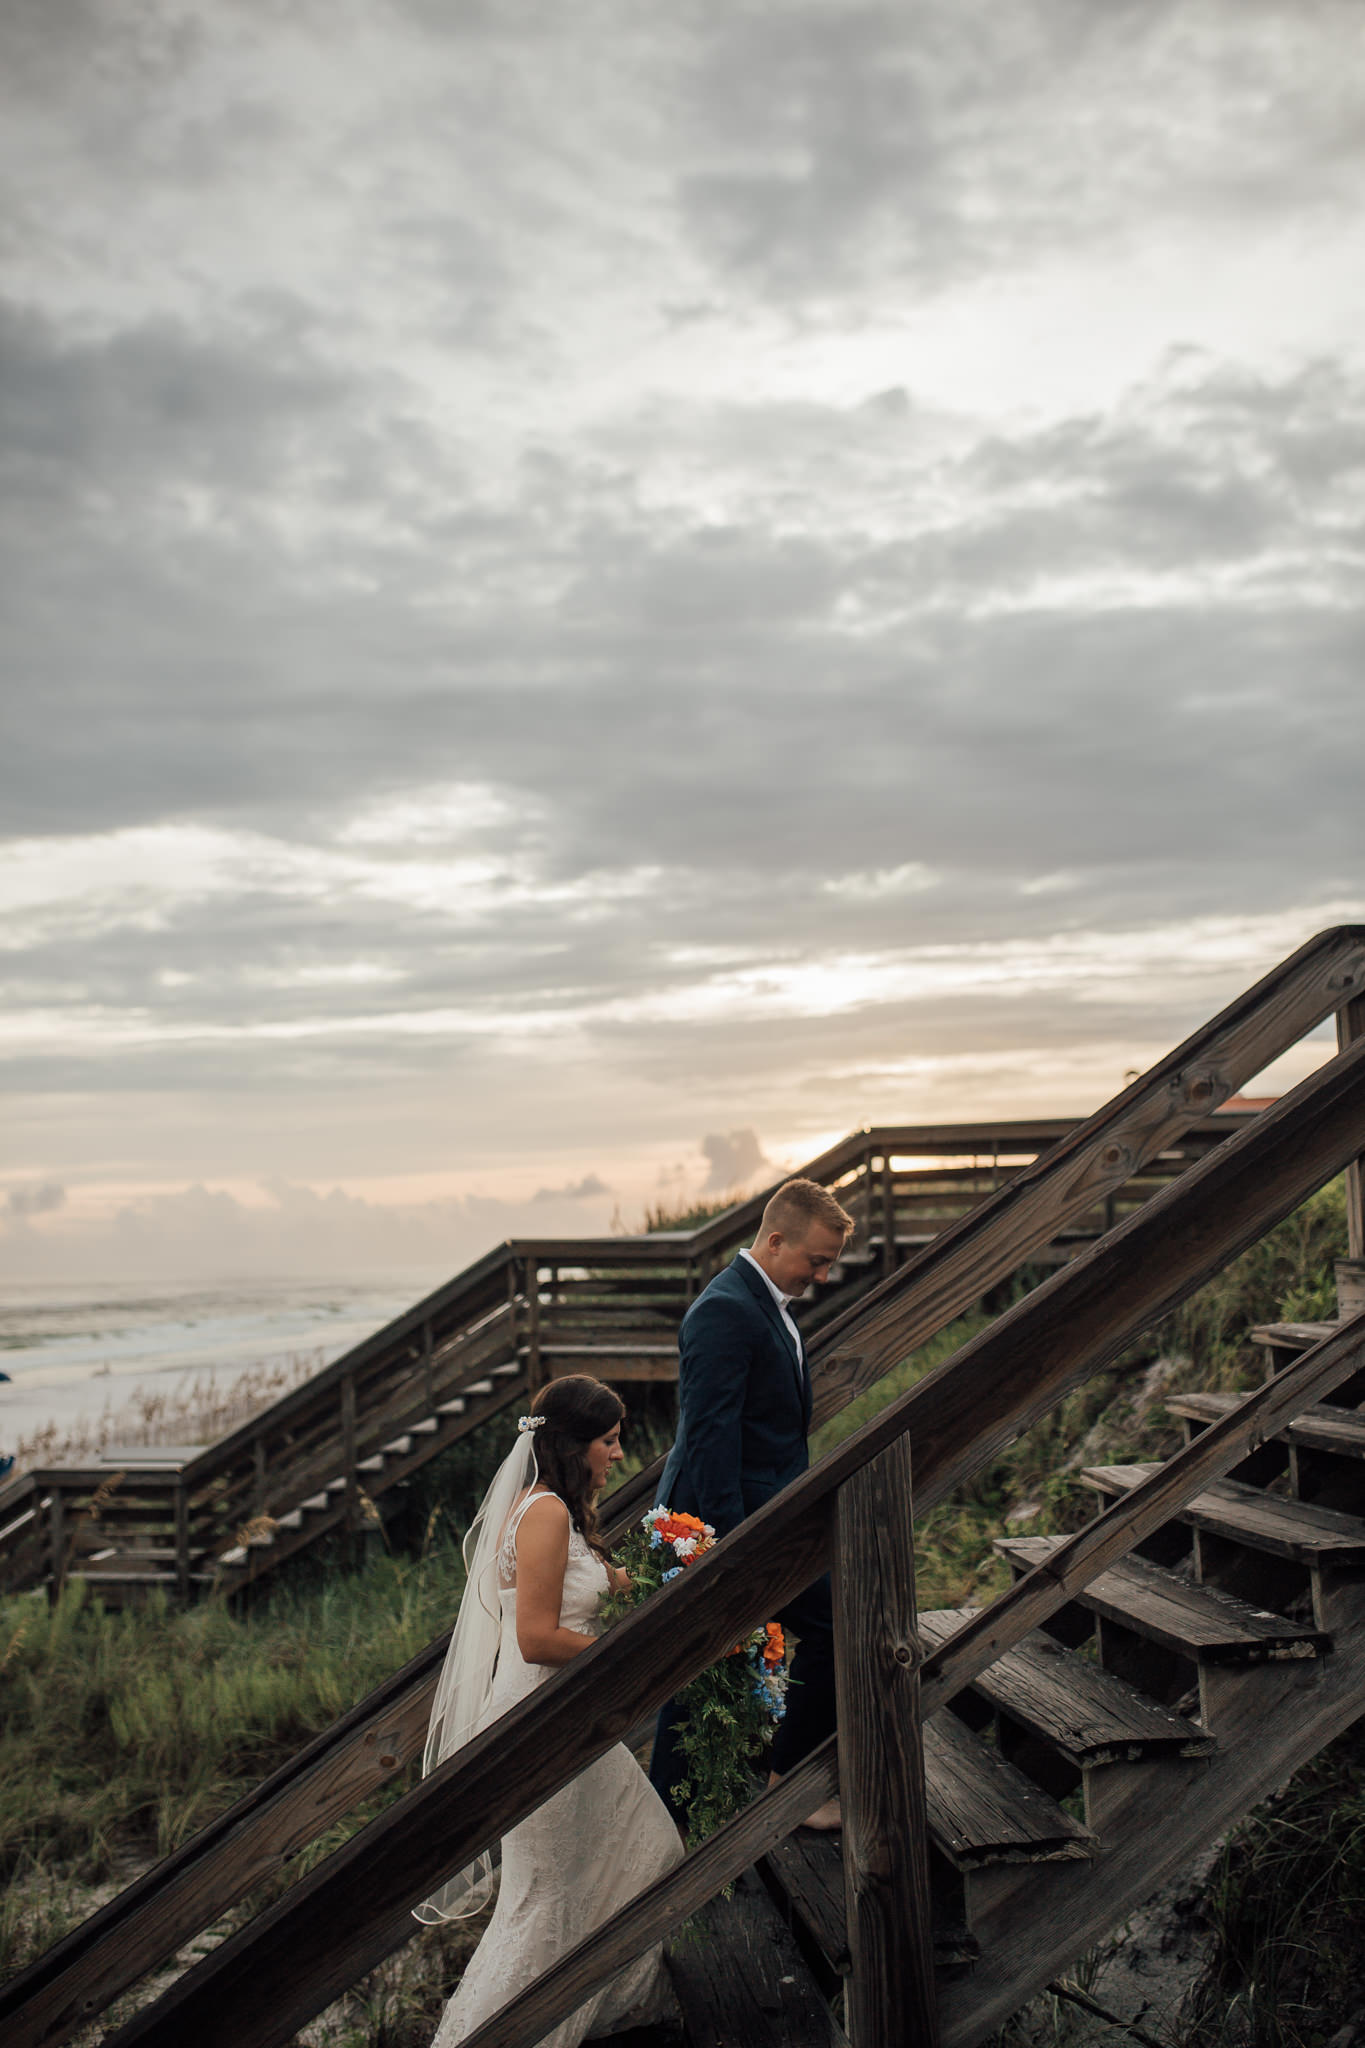 cassie-cook-photography-santa-rosa-beach-fl-wedding-farrar-wedding-beach-wedding-destination-wedding